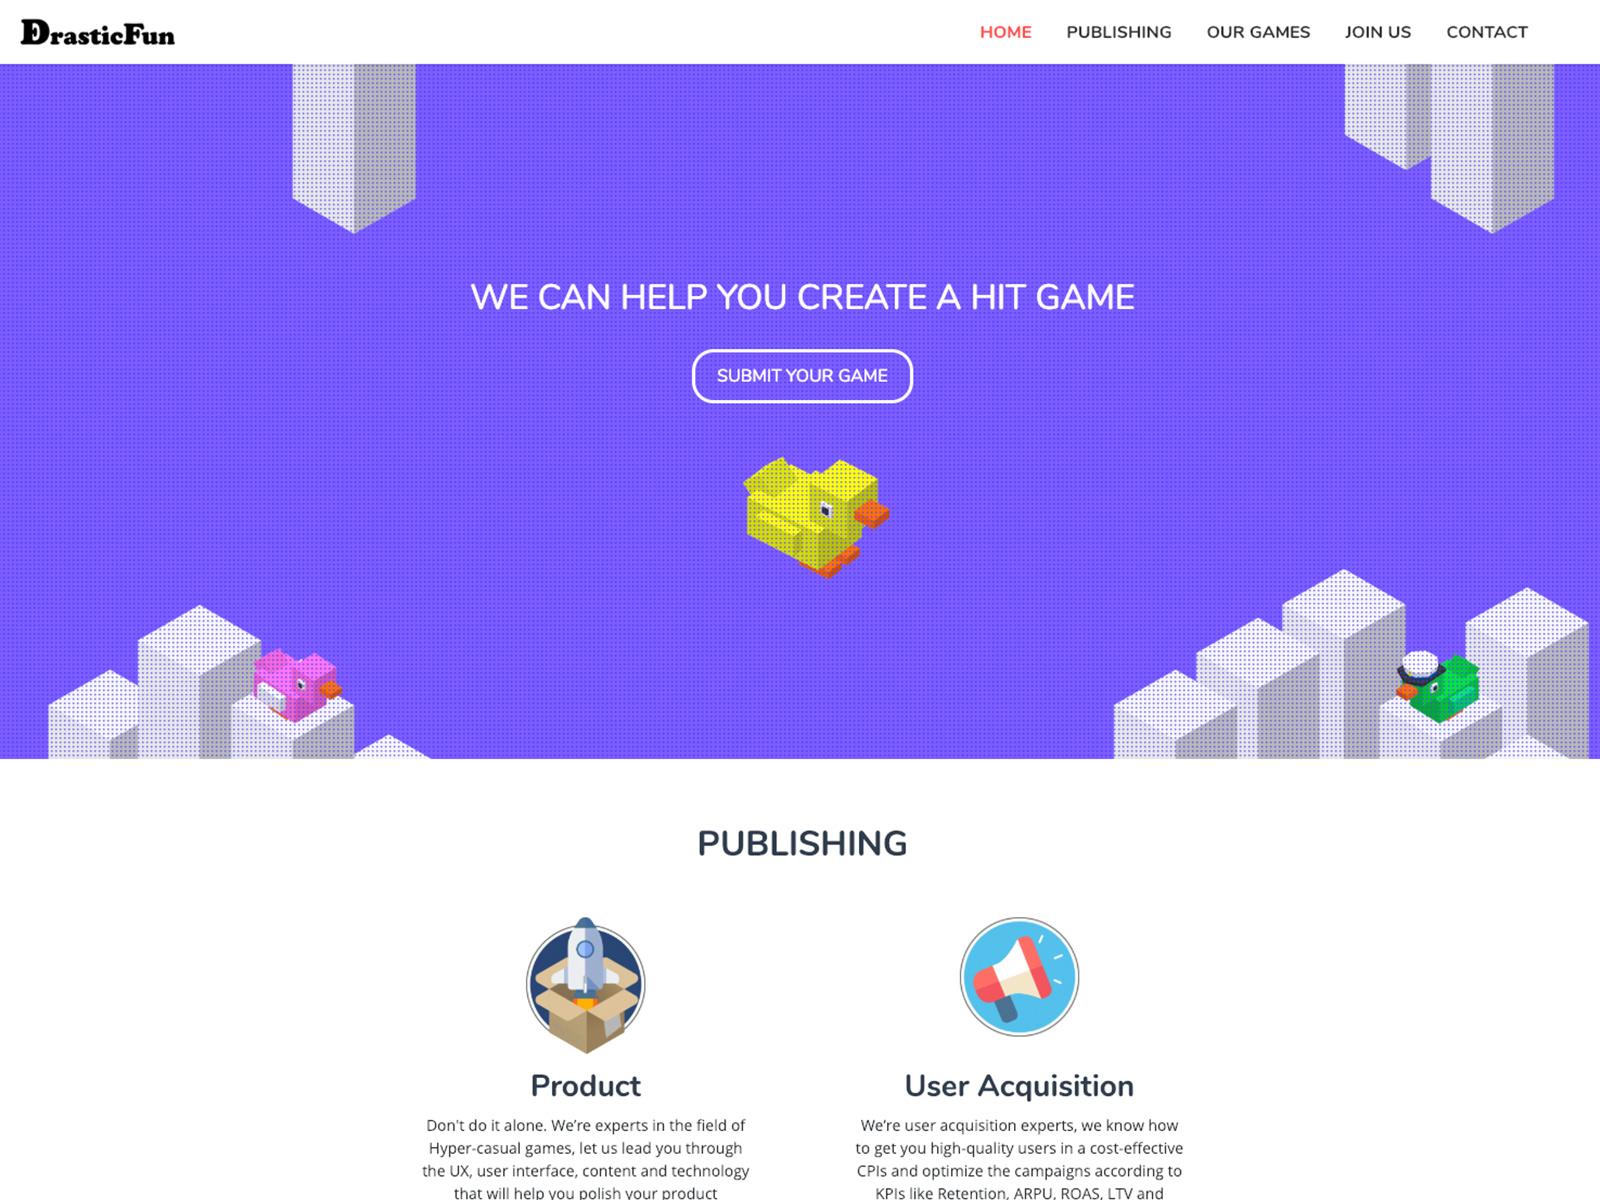 DrasticFun - Home Page